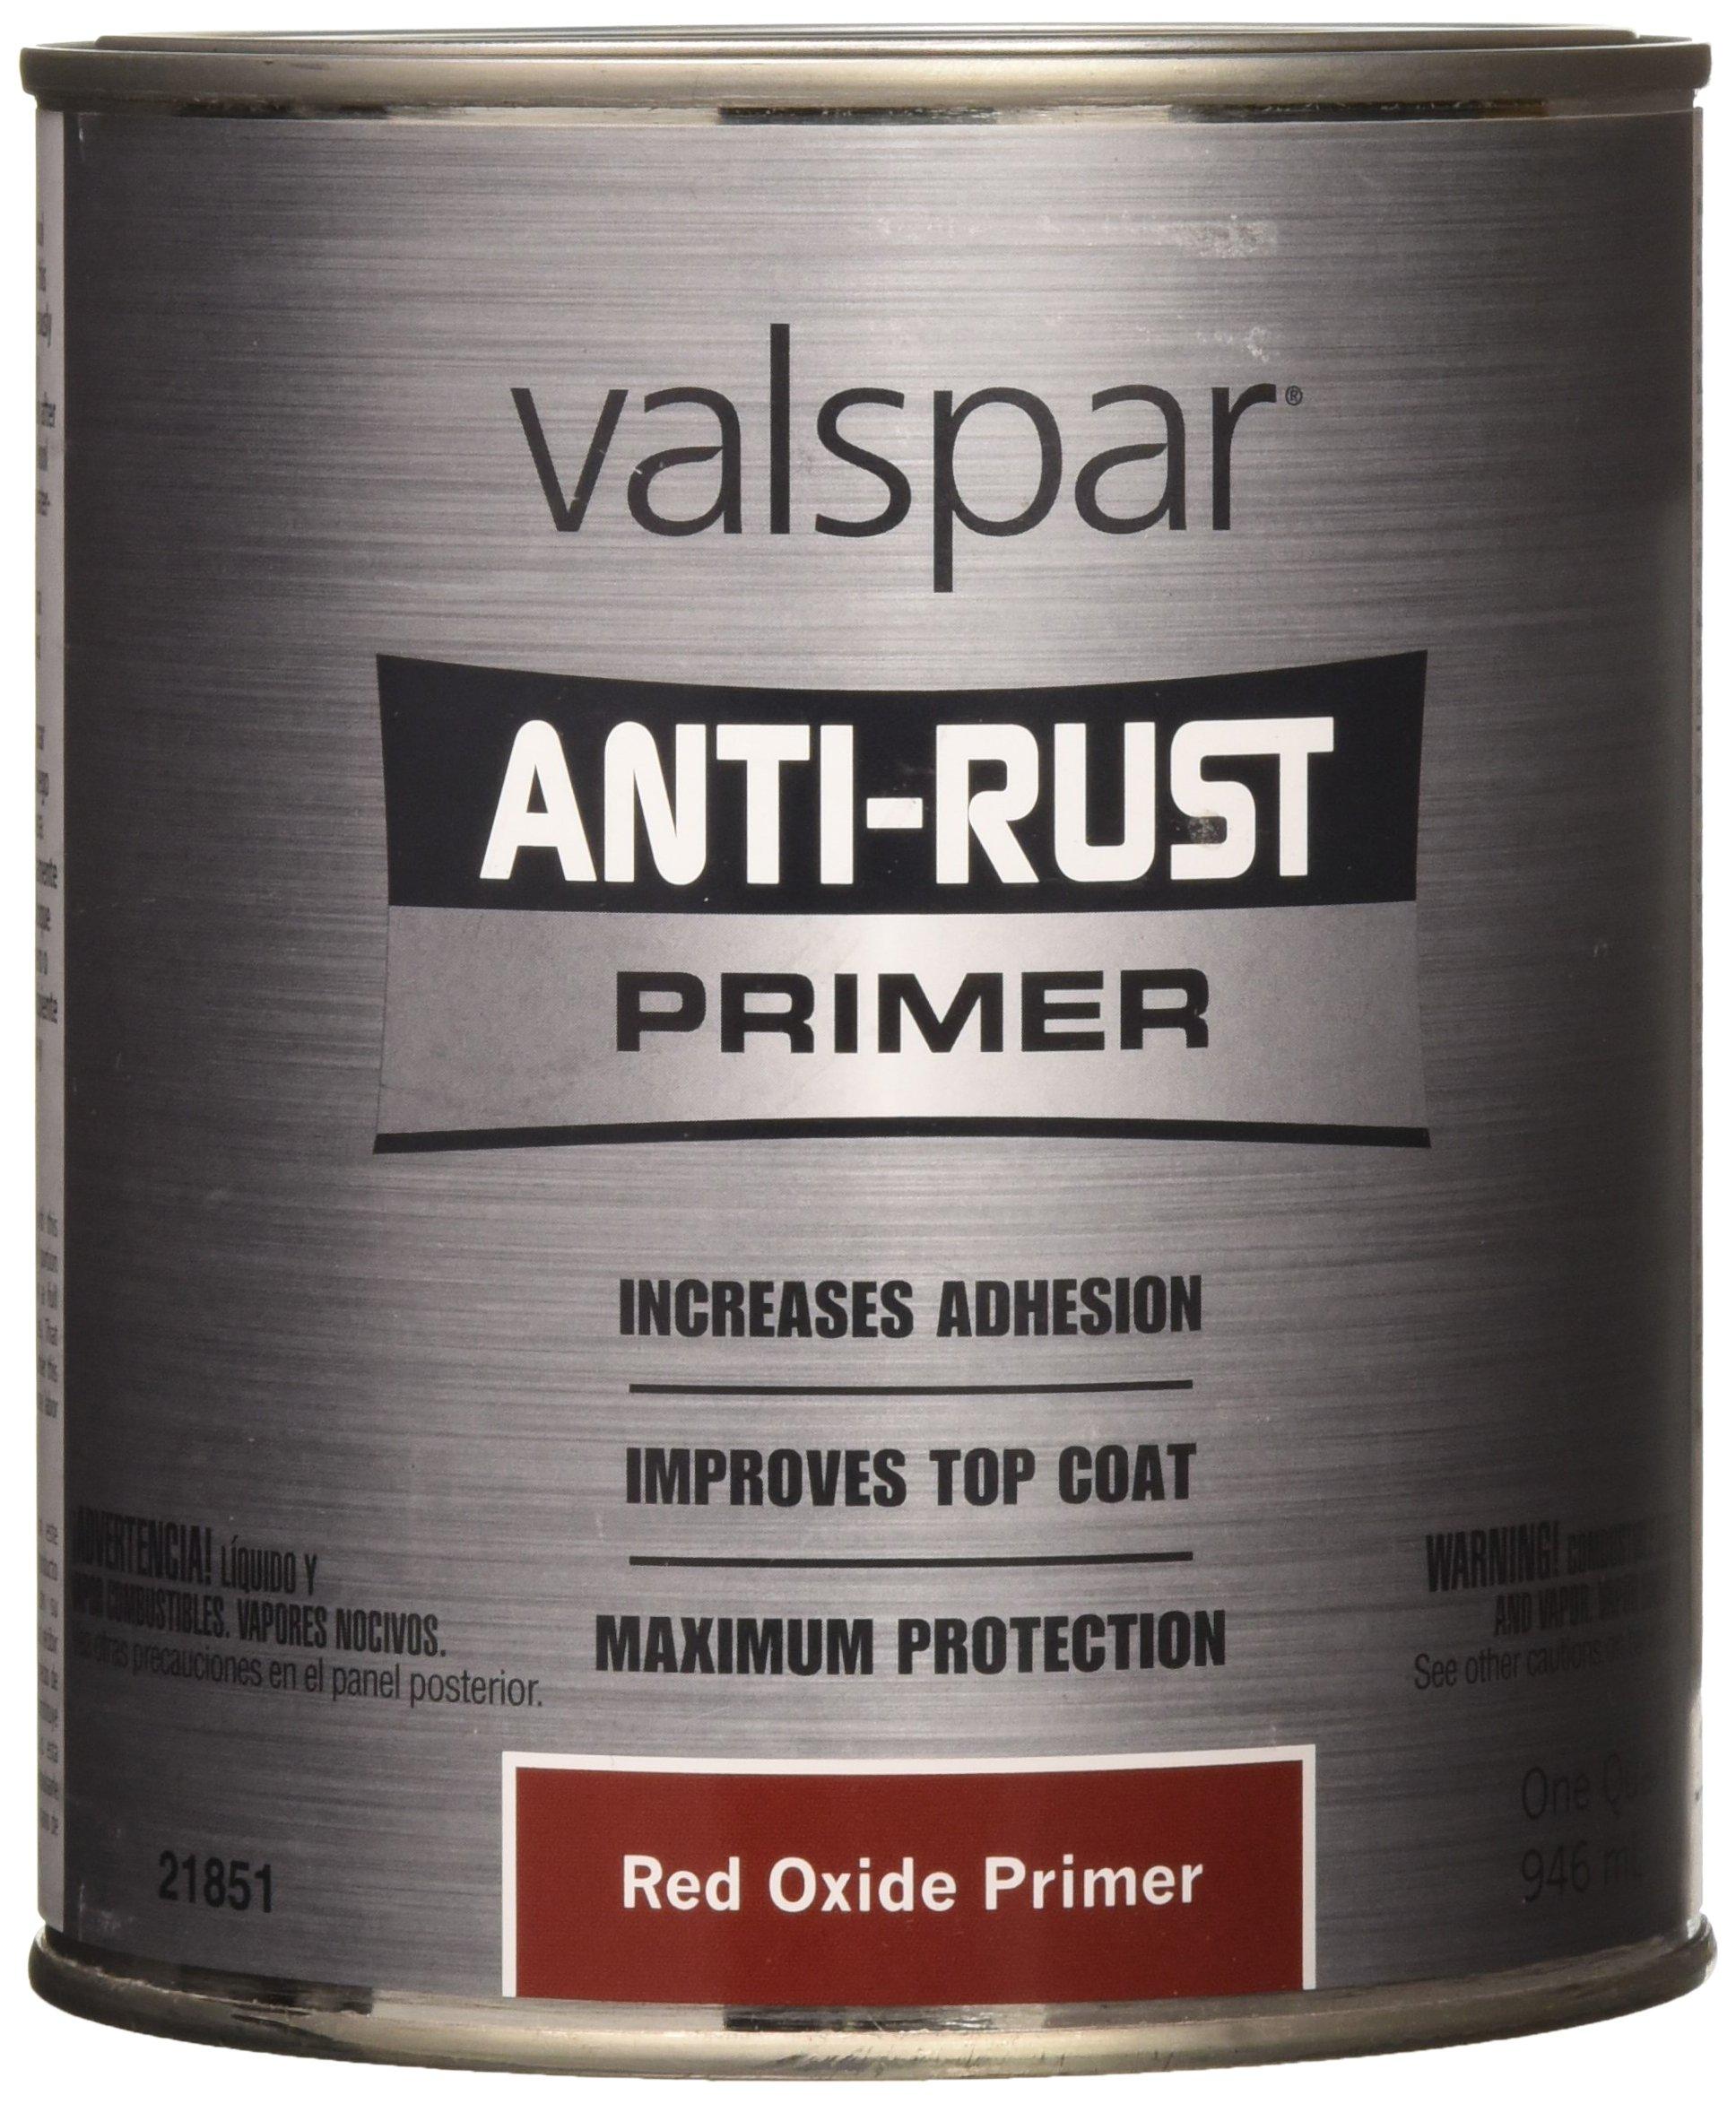 Valspar 21851Q Red Oxide Primer Enamel - 1 Quart